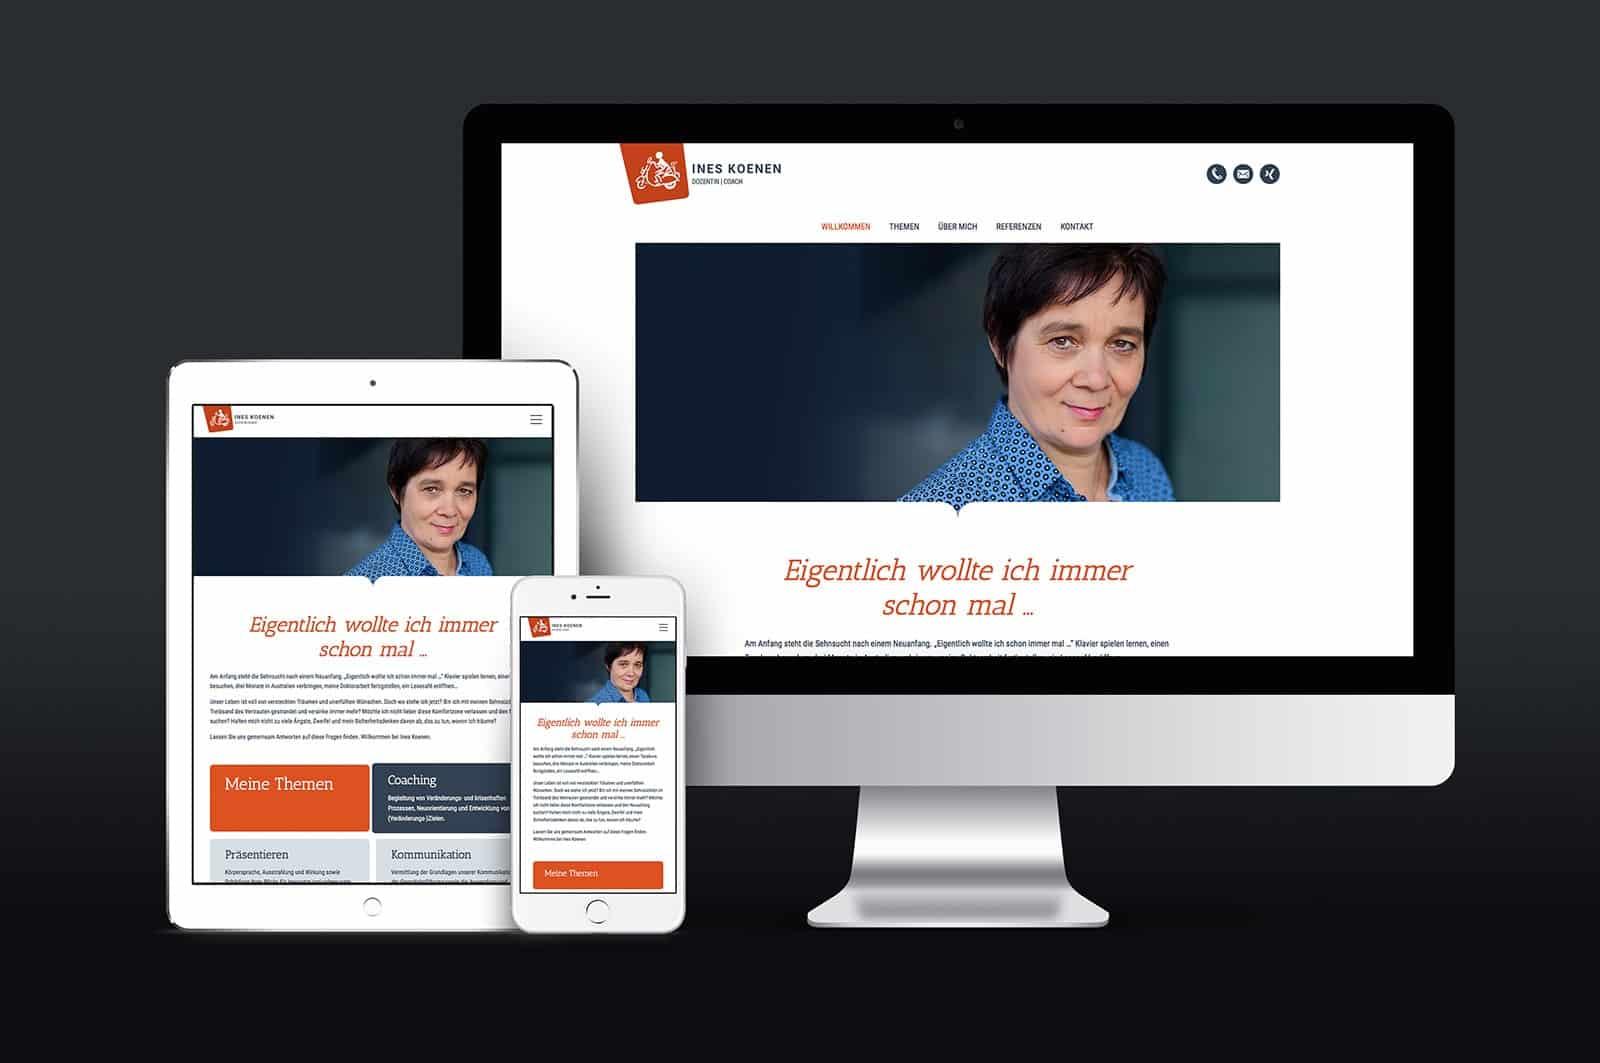 webdesign_koenen_mockup-1